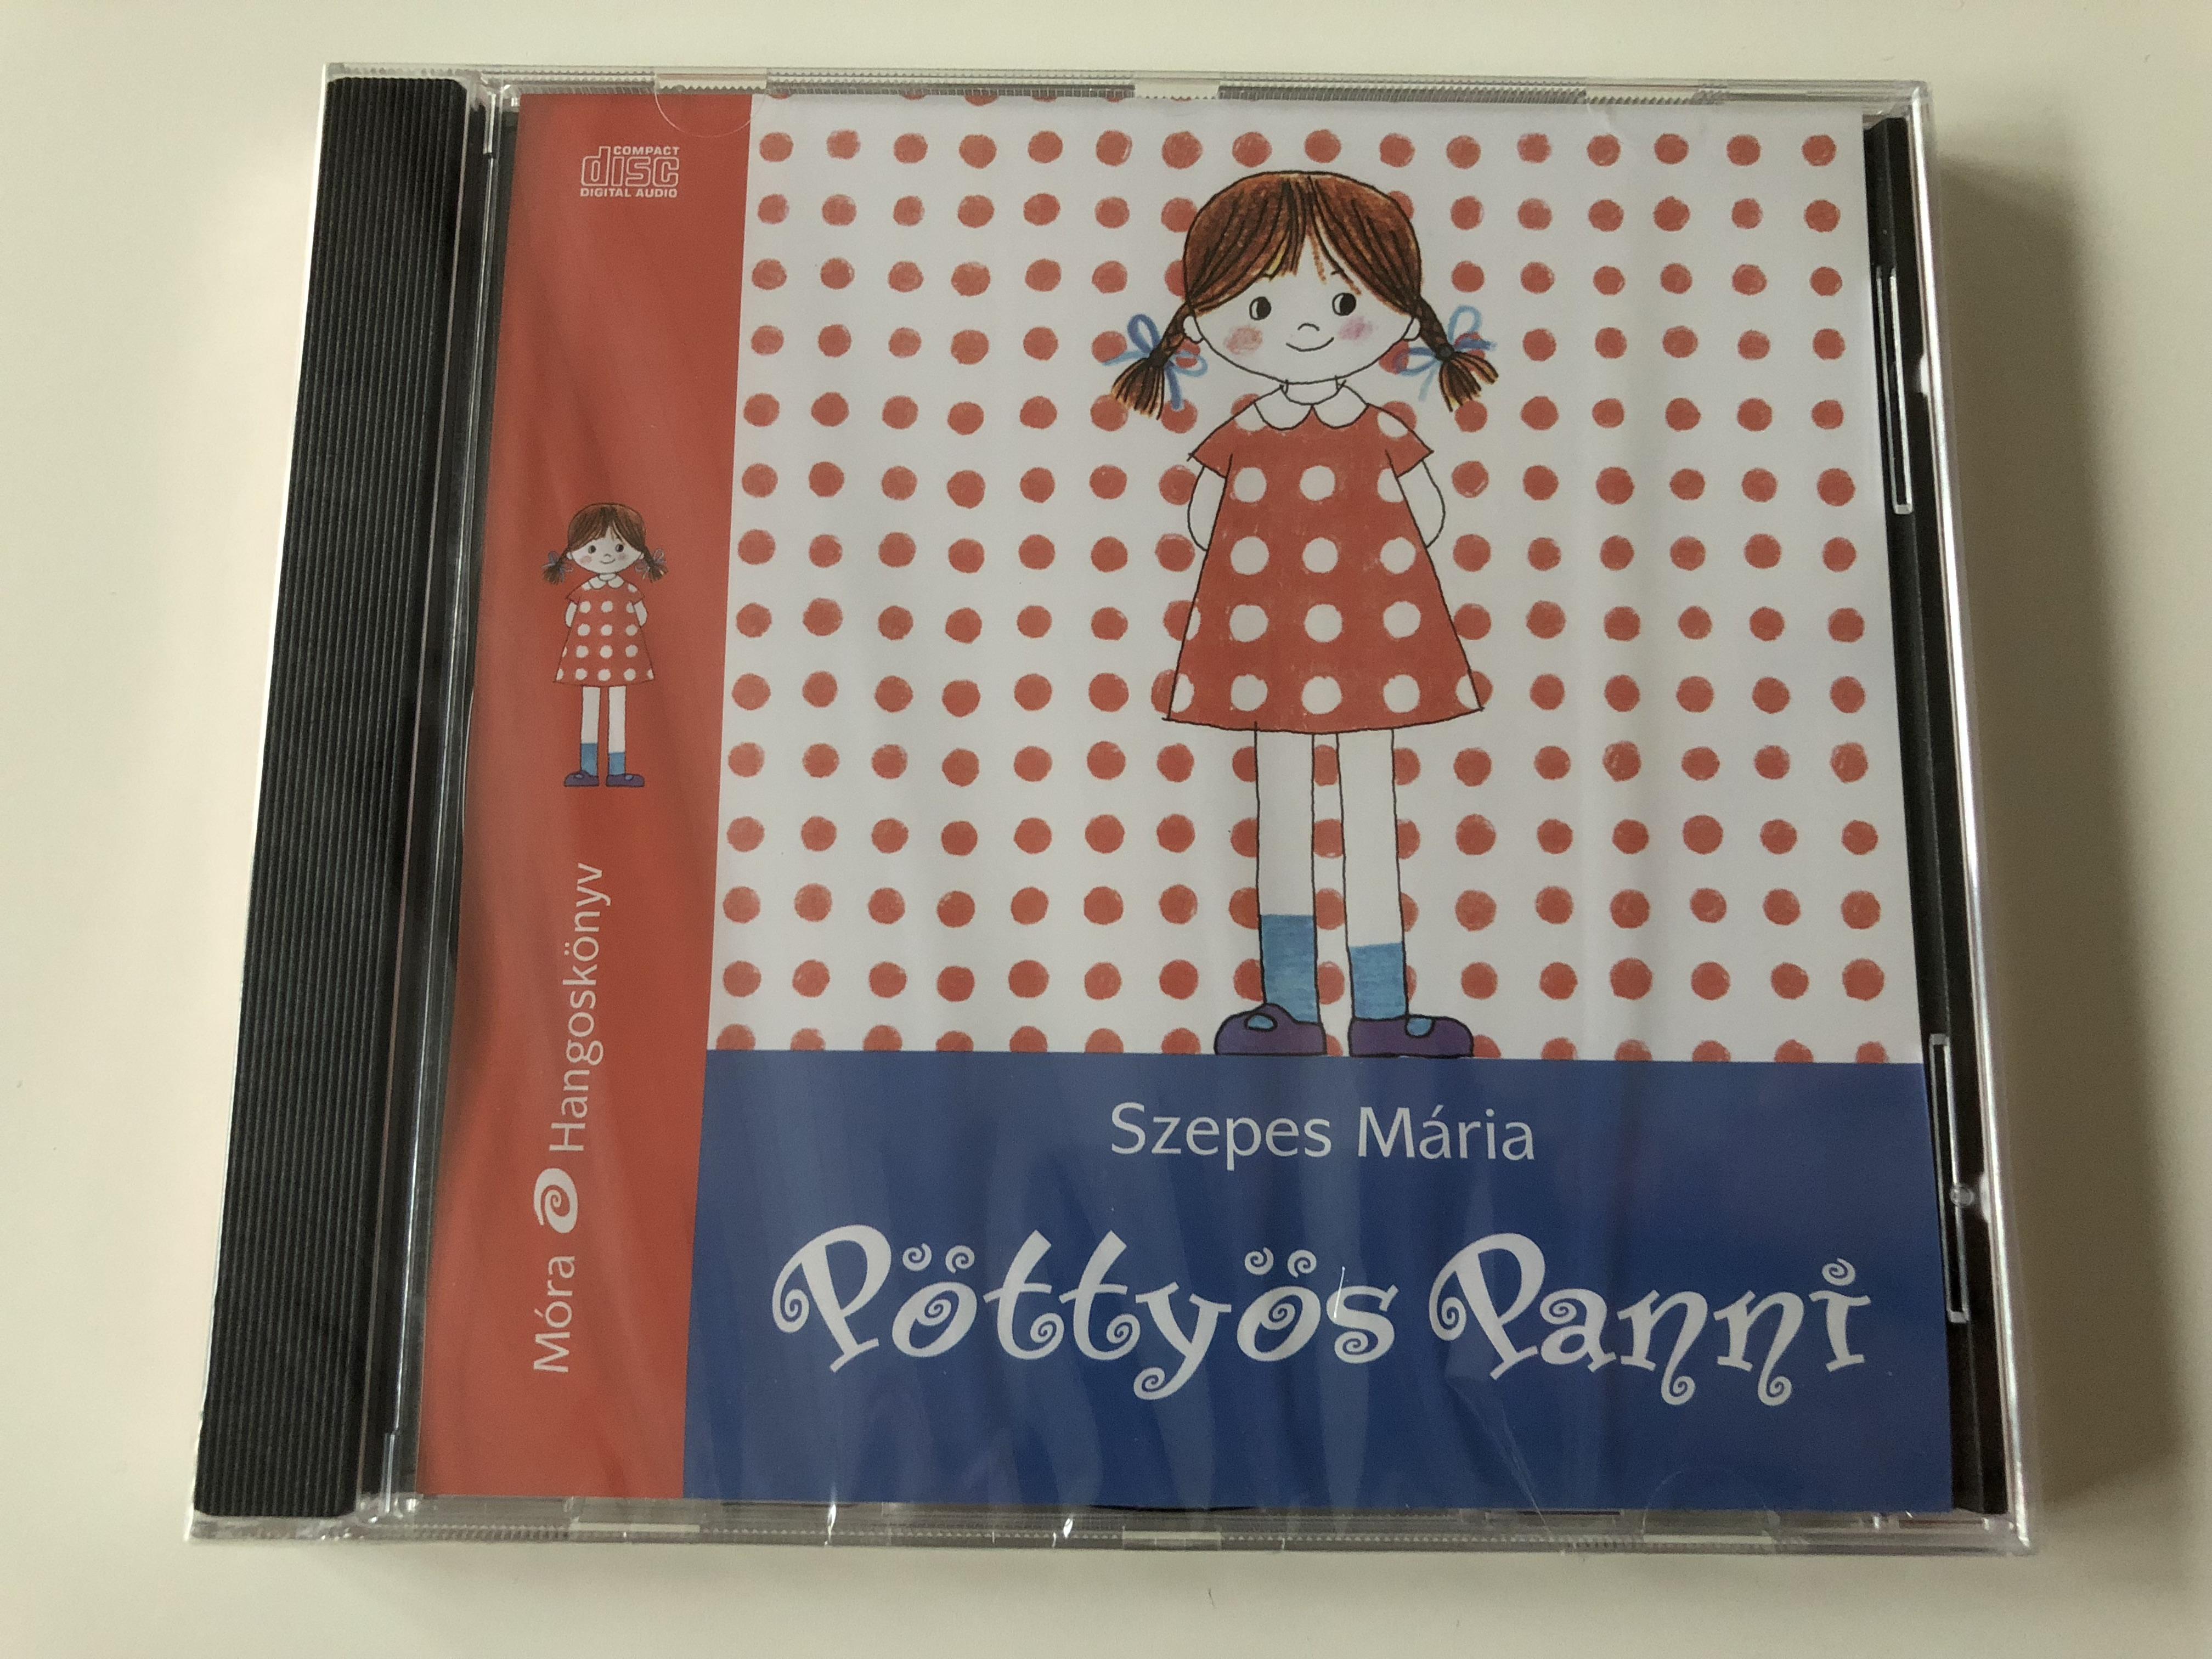 p-tty-s-panni-by-szepes-m-ria-hungarian-language-audio-book-read-by-venczel-vera-m-ra-k-nyvkiad-2015-2-.jpg